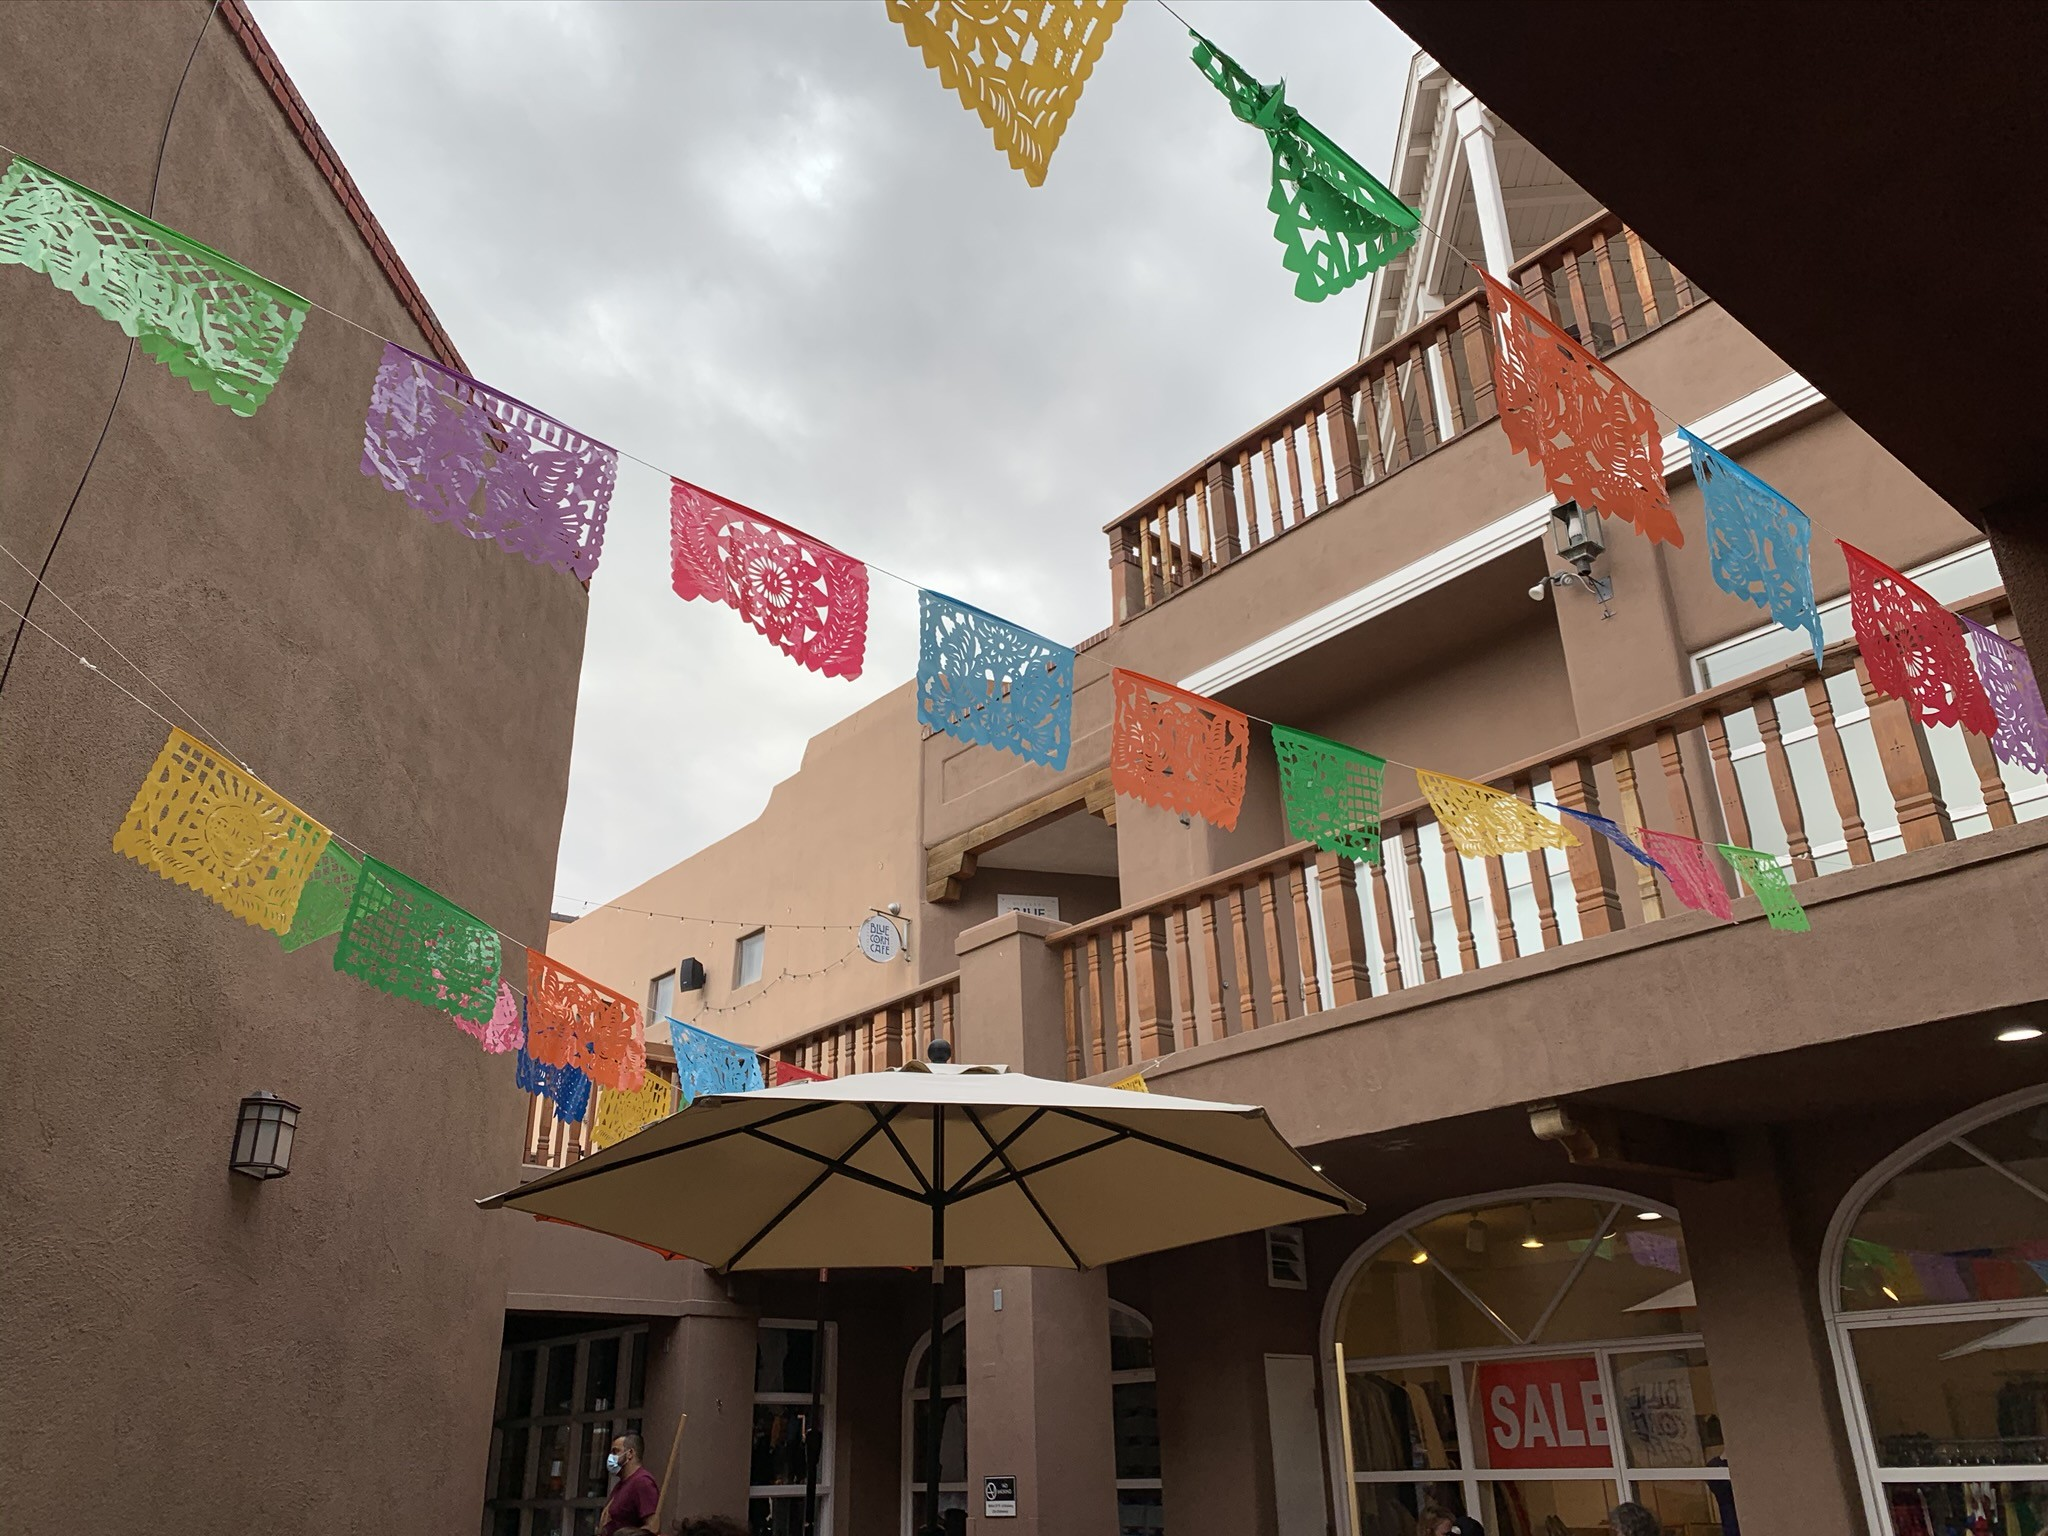 La Fogata Restaurant II, Santa Fe, New Mexico